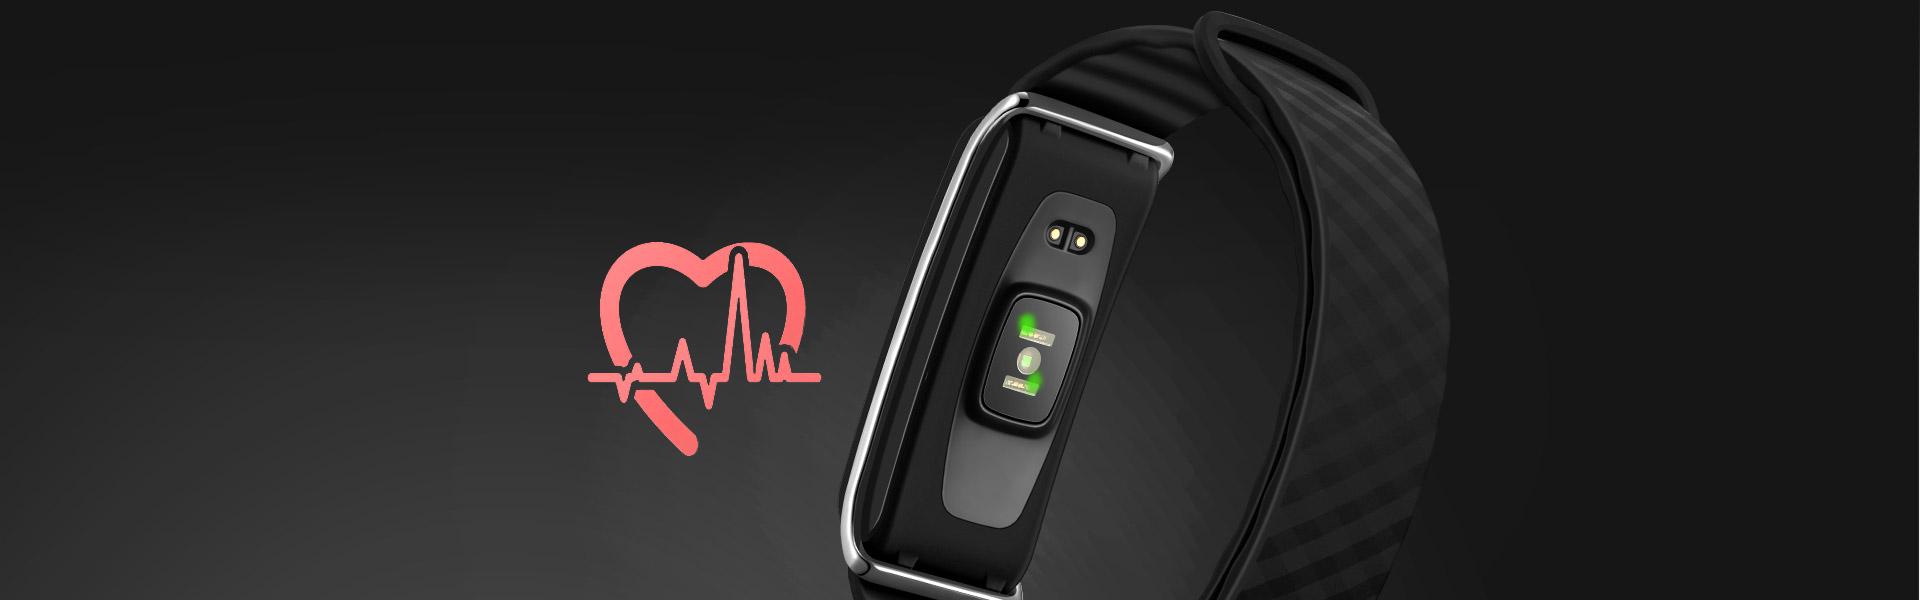 Huawei Renk Bandı A2 kalp hızı monitörü